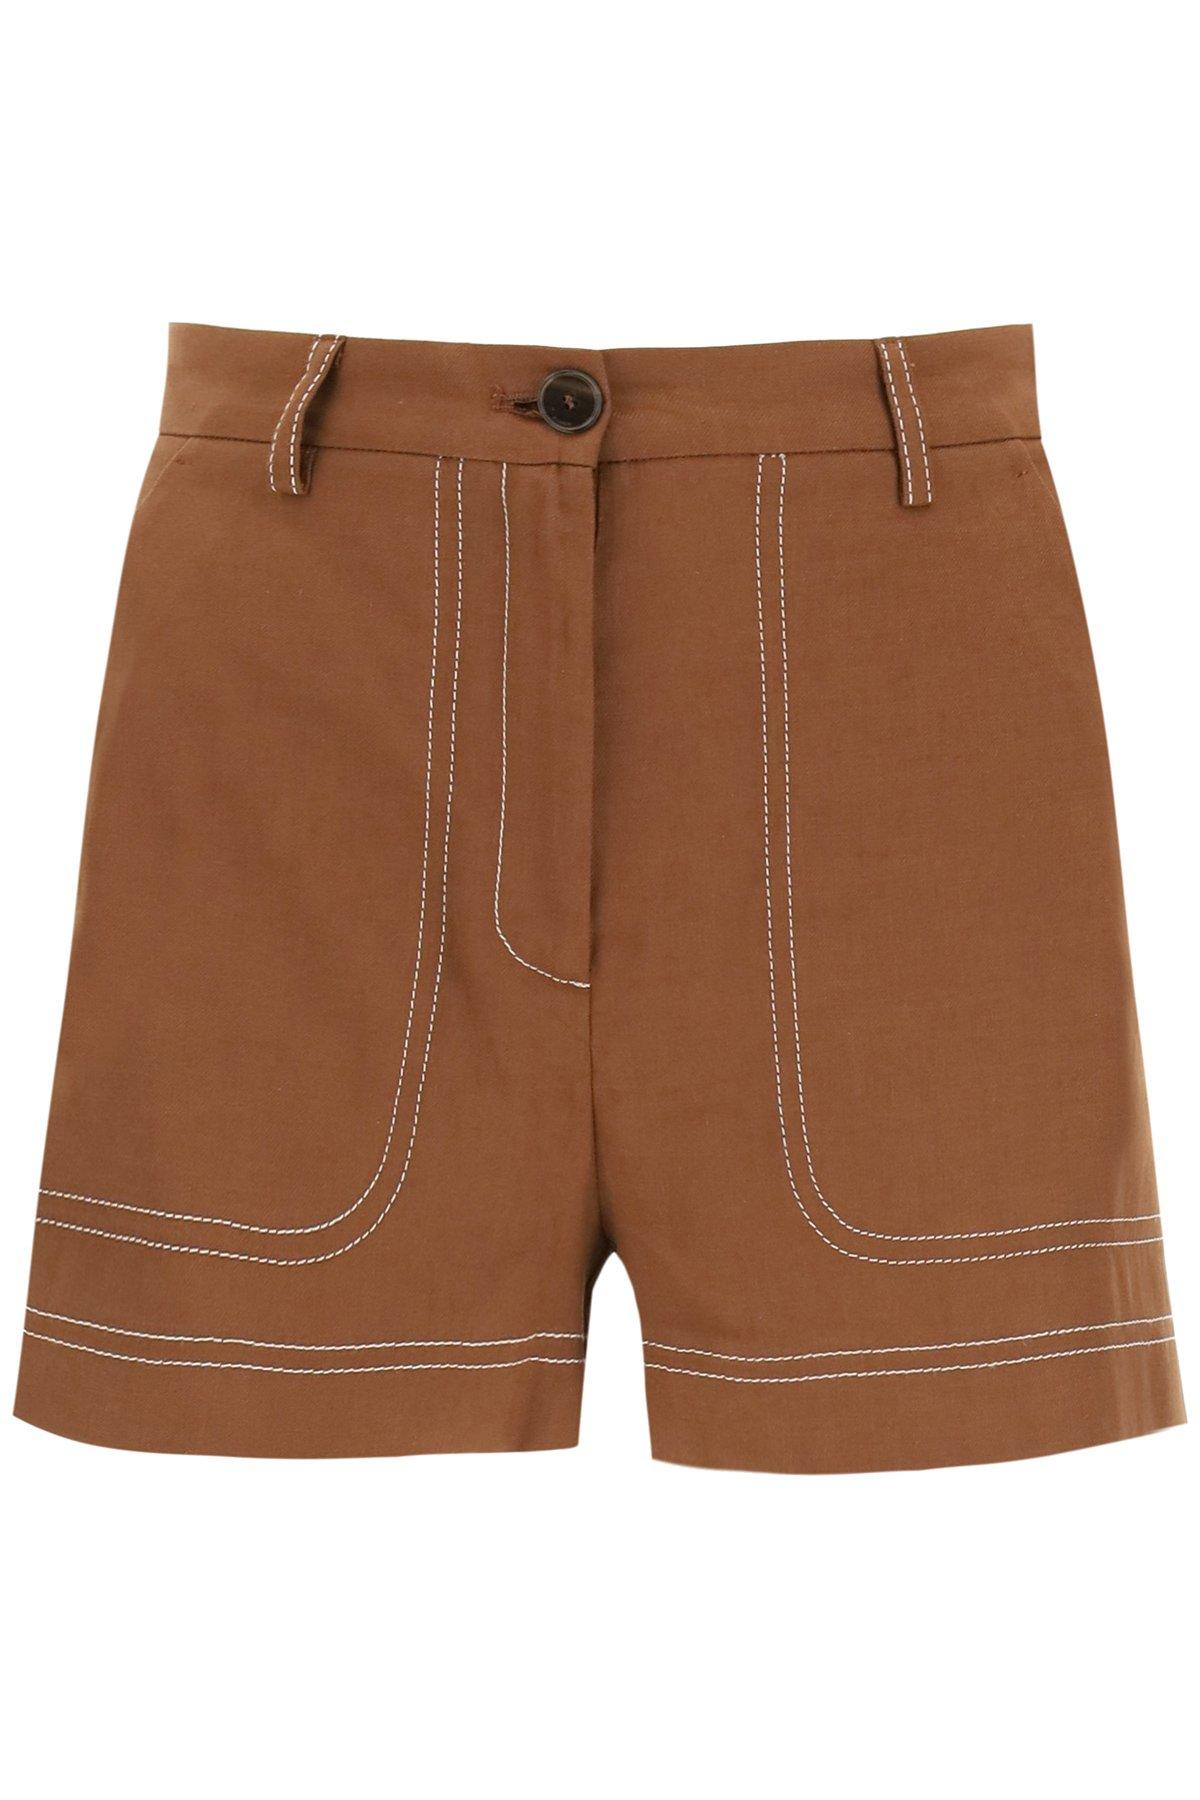 Pinko short in cotone